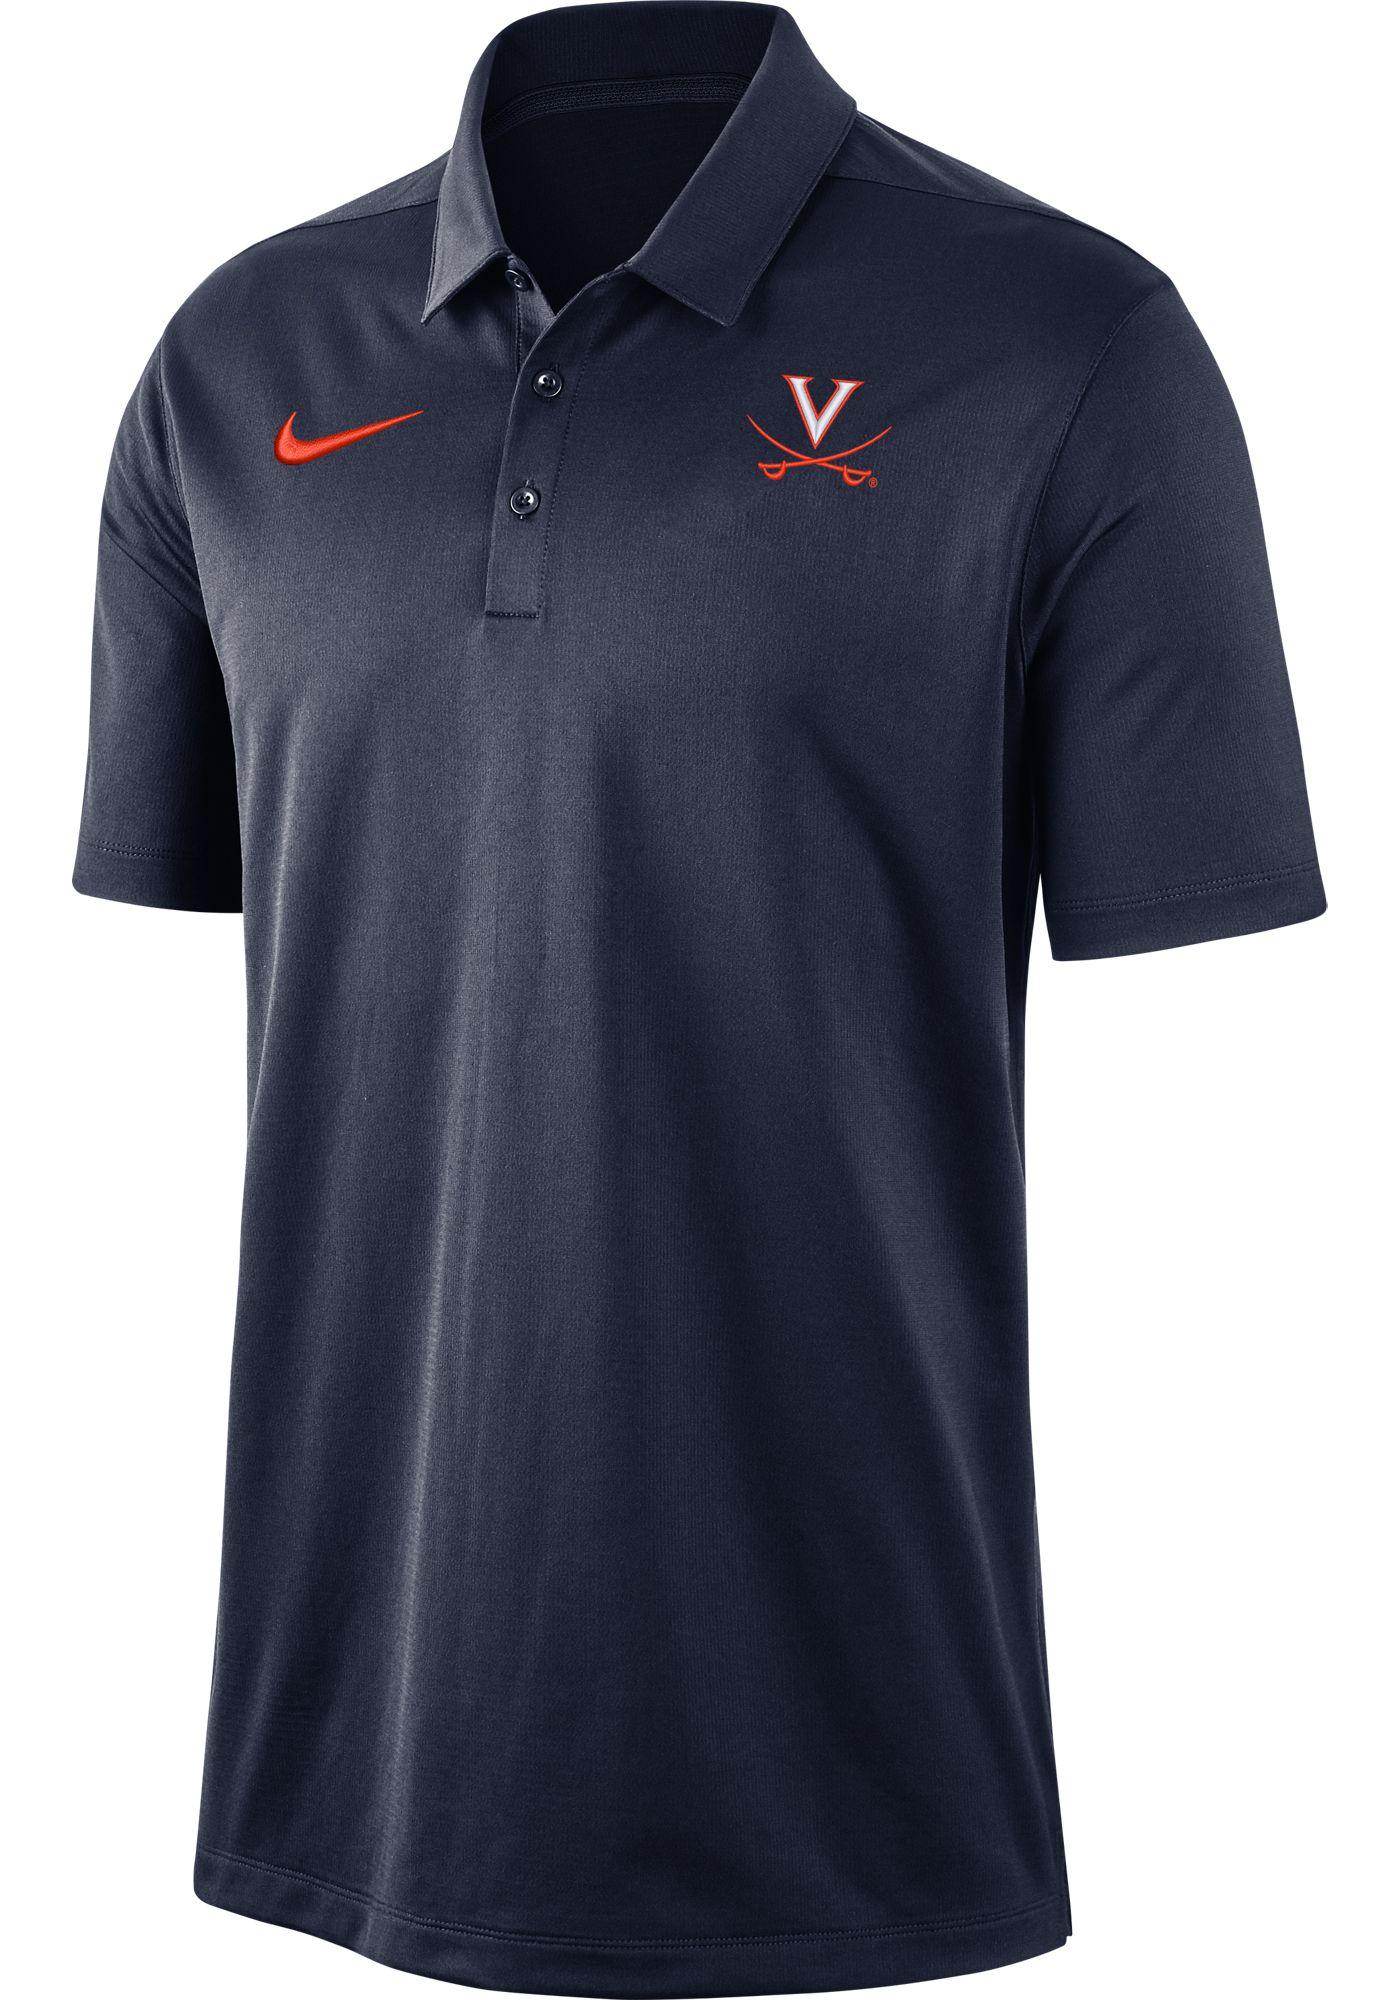 Nike Men's Virginia Cavaliers Blue Dri-FIT Franchise Polo